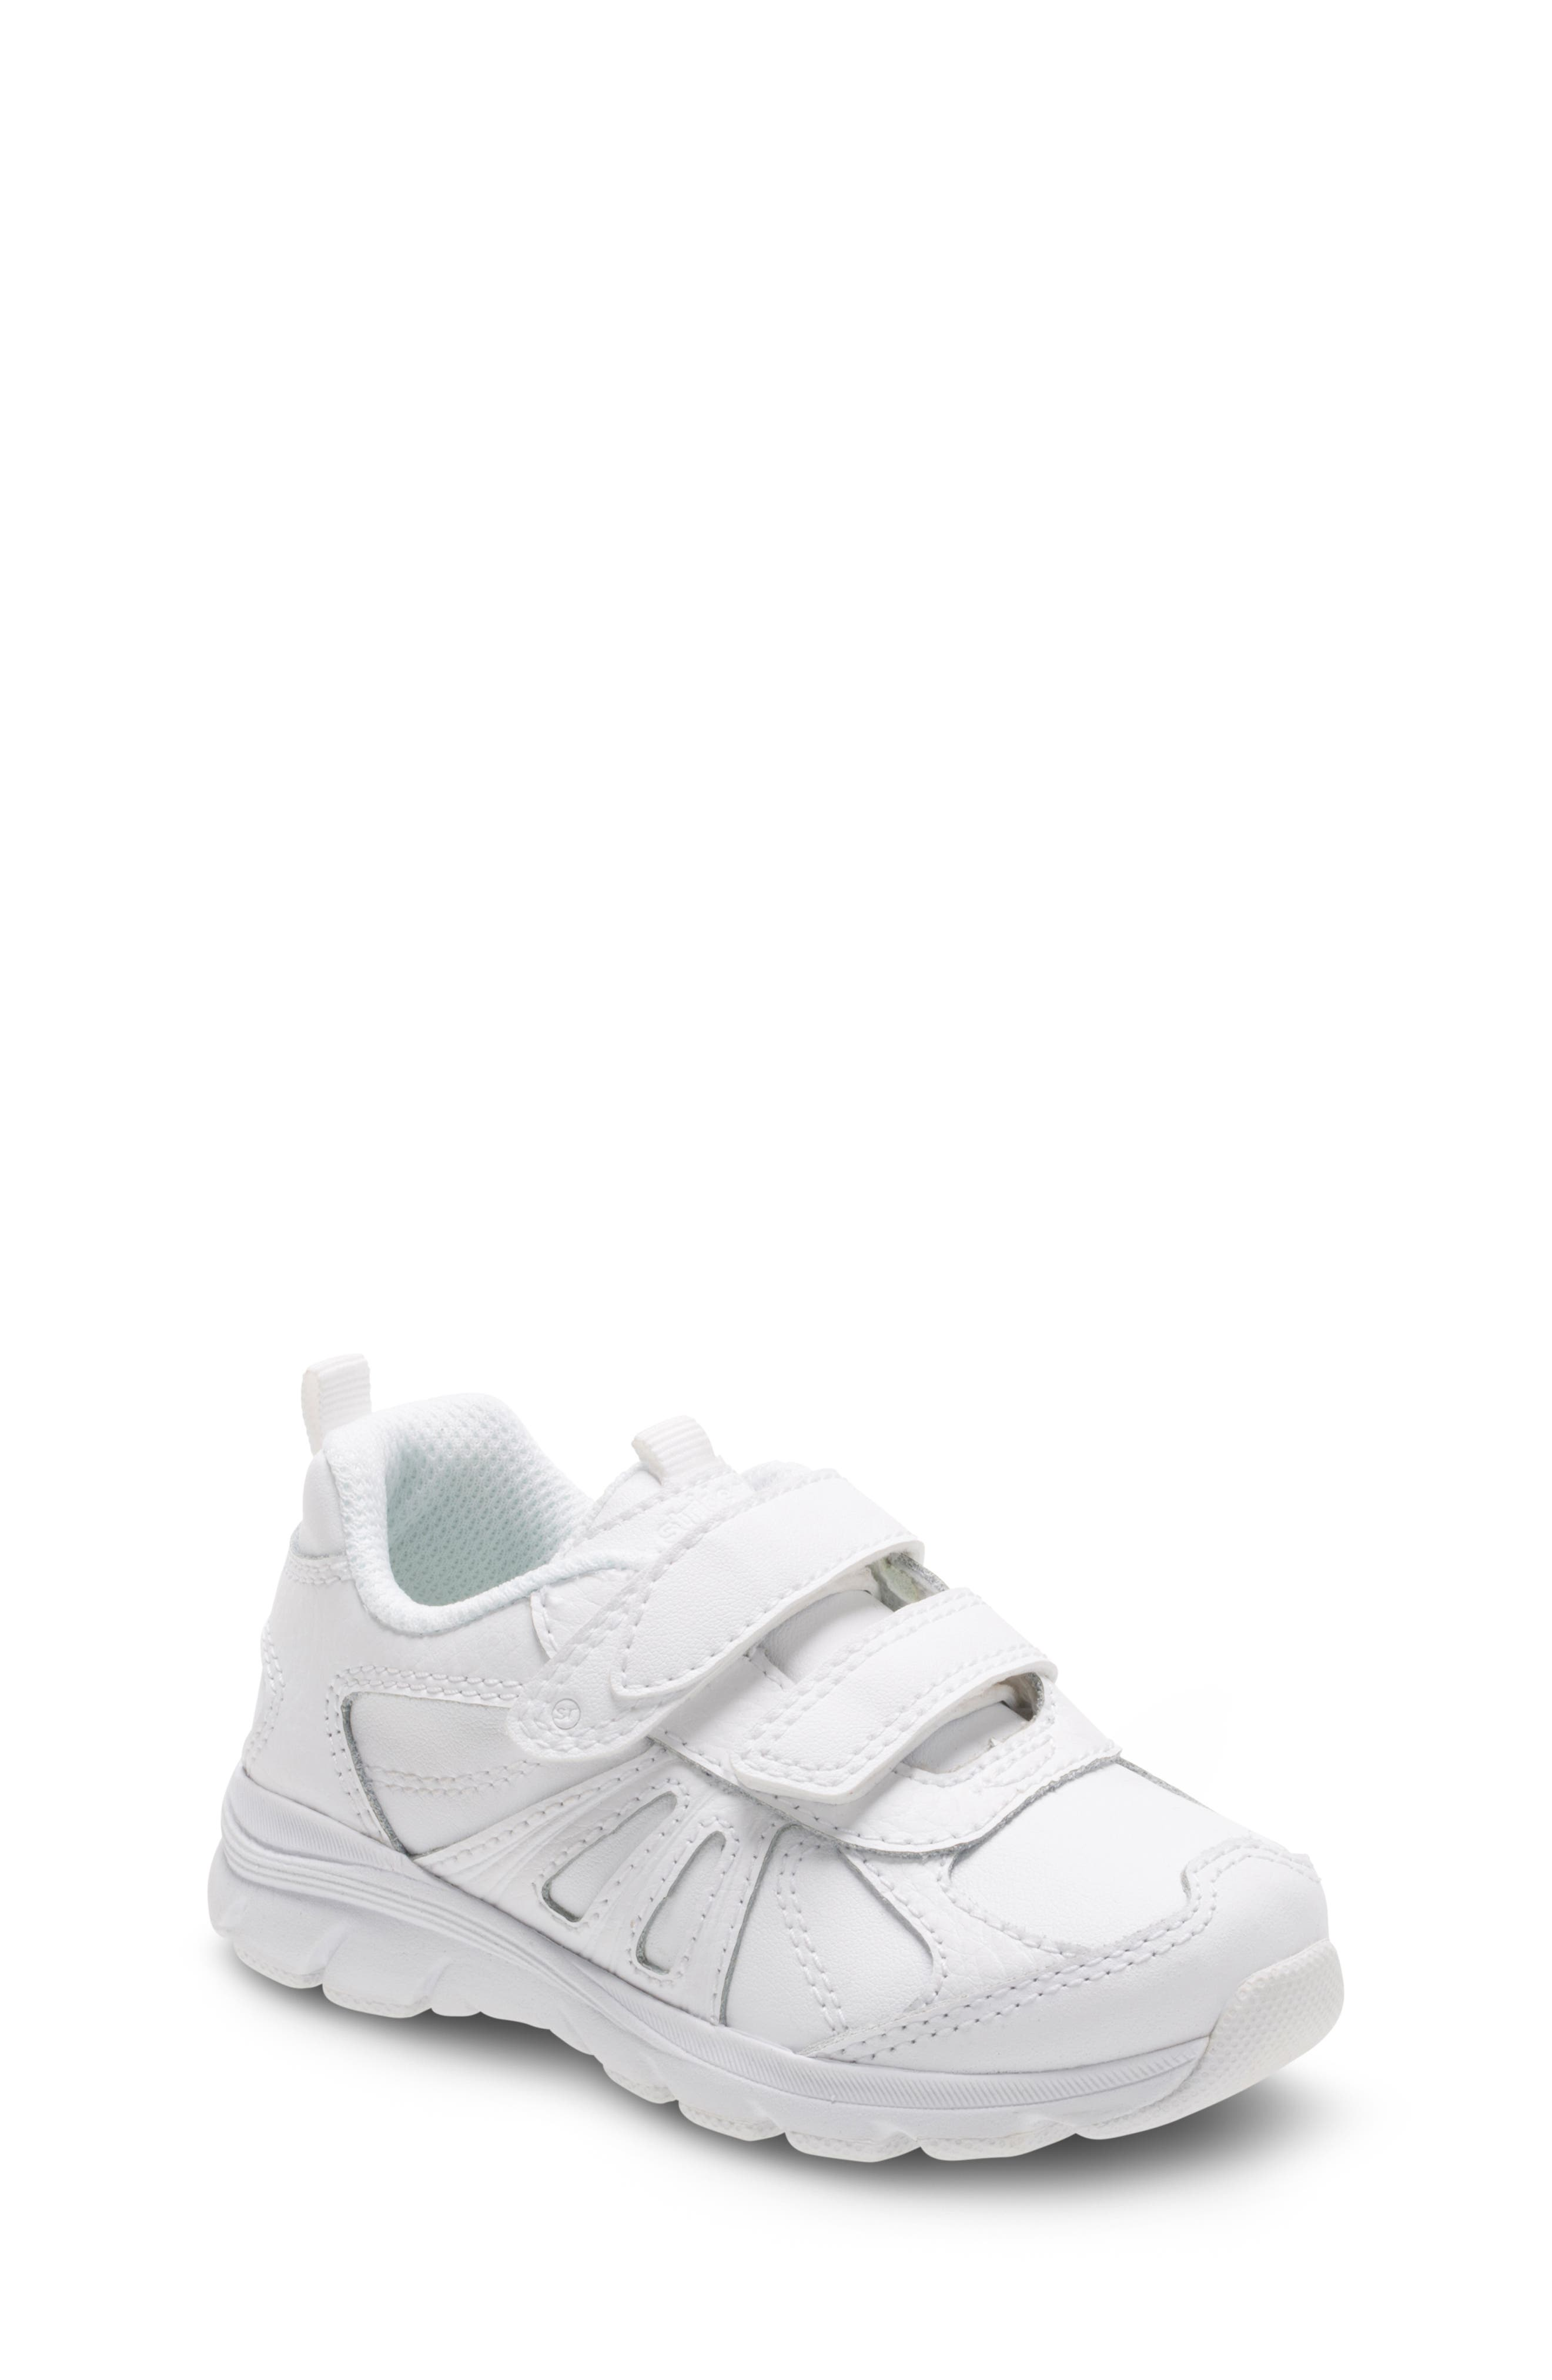 Cooper 2.0 Sneaker,                             Main thumbnail 1, color,                             WHITE